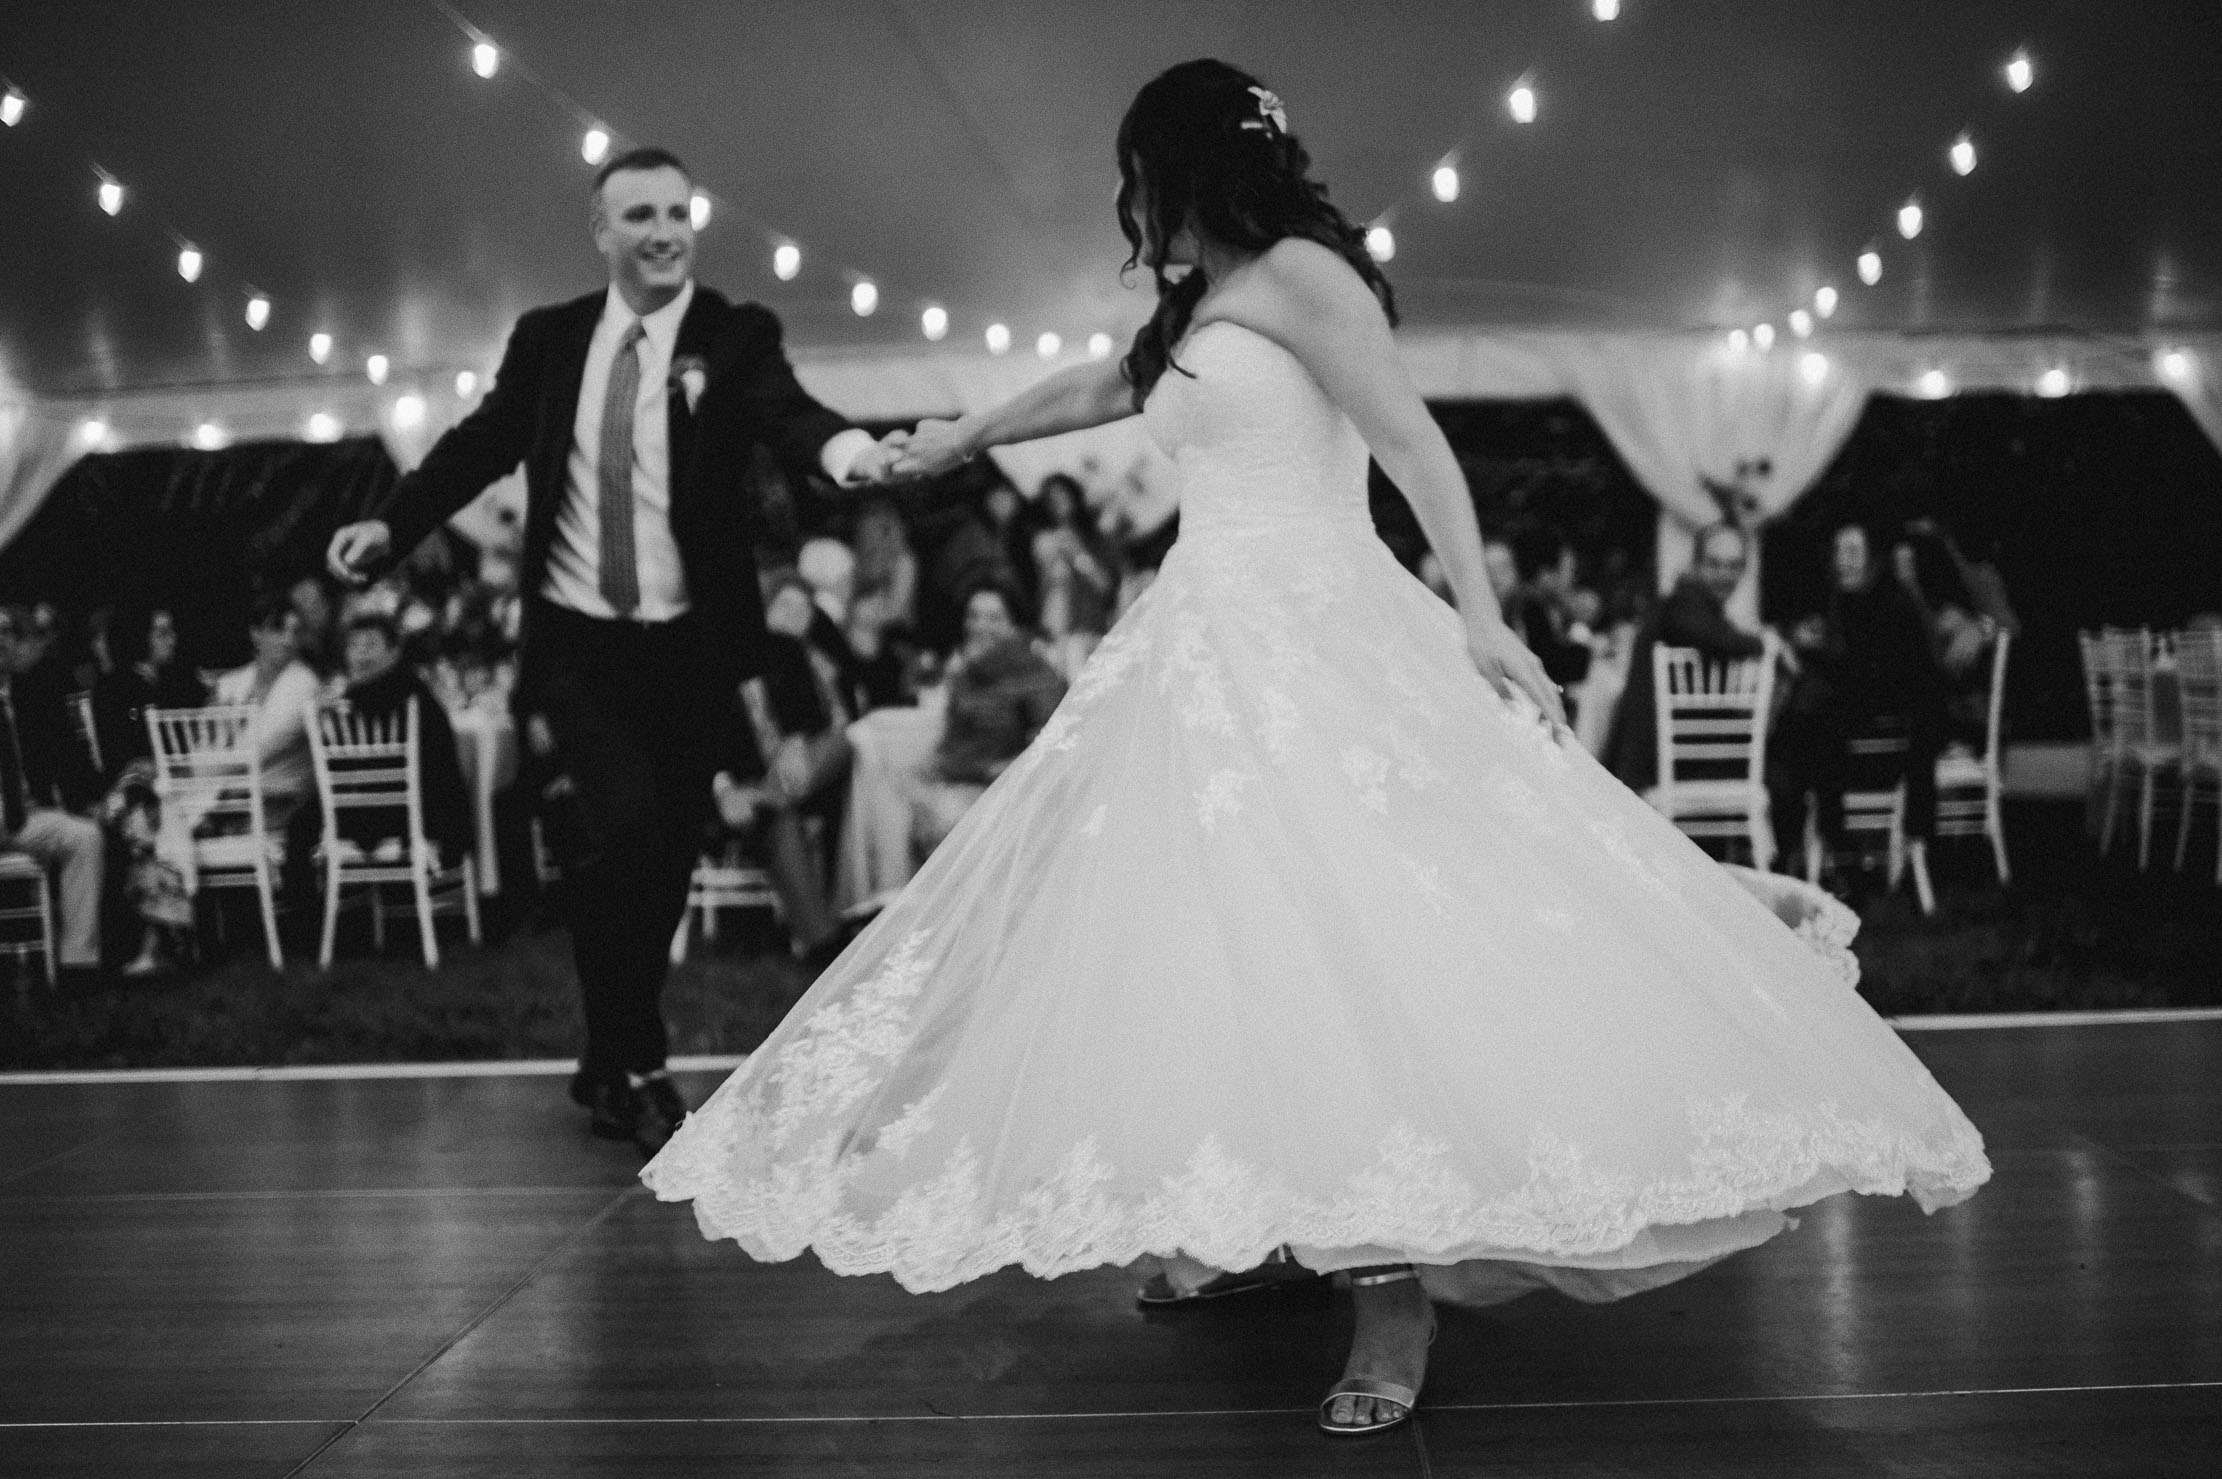 Wings-Castle-Millbrook-NY-Upstate-Wedding-Photographer-1144.jpg